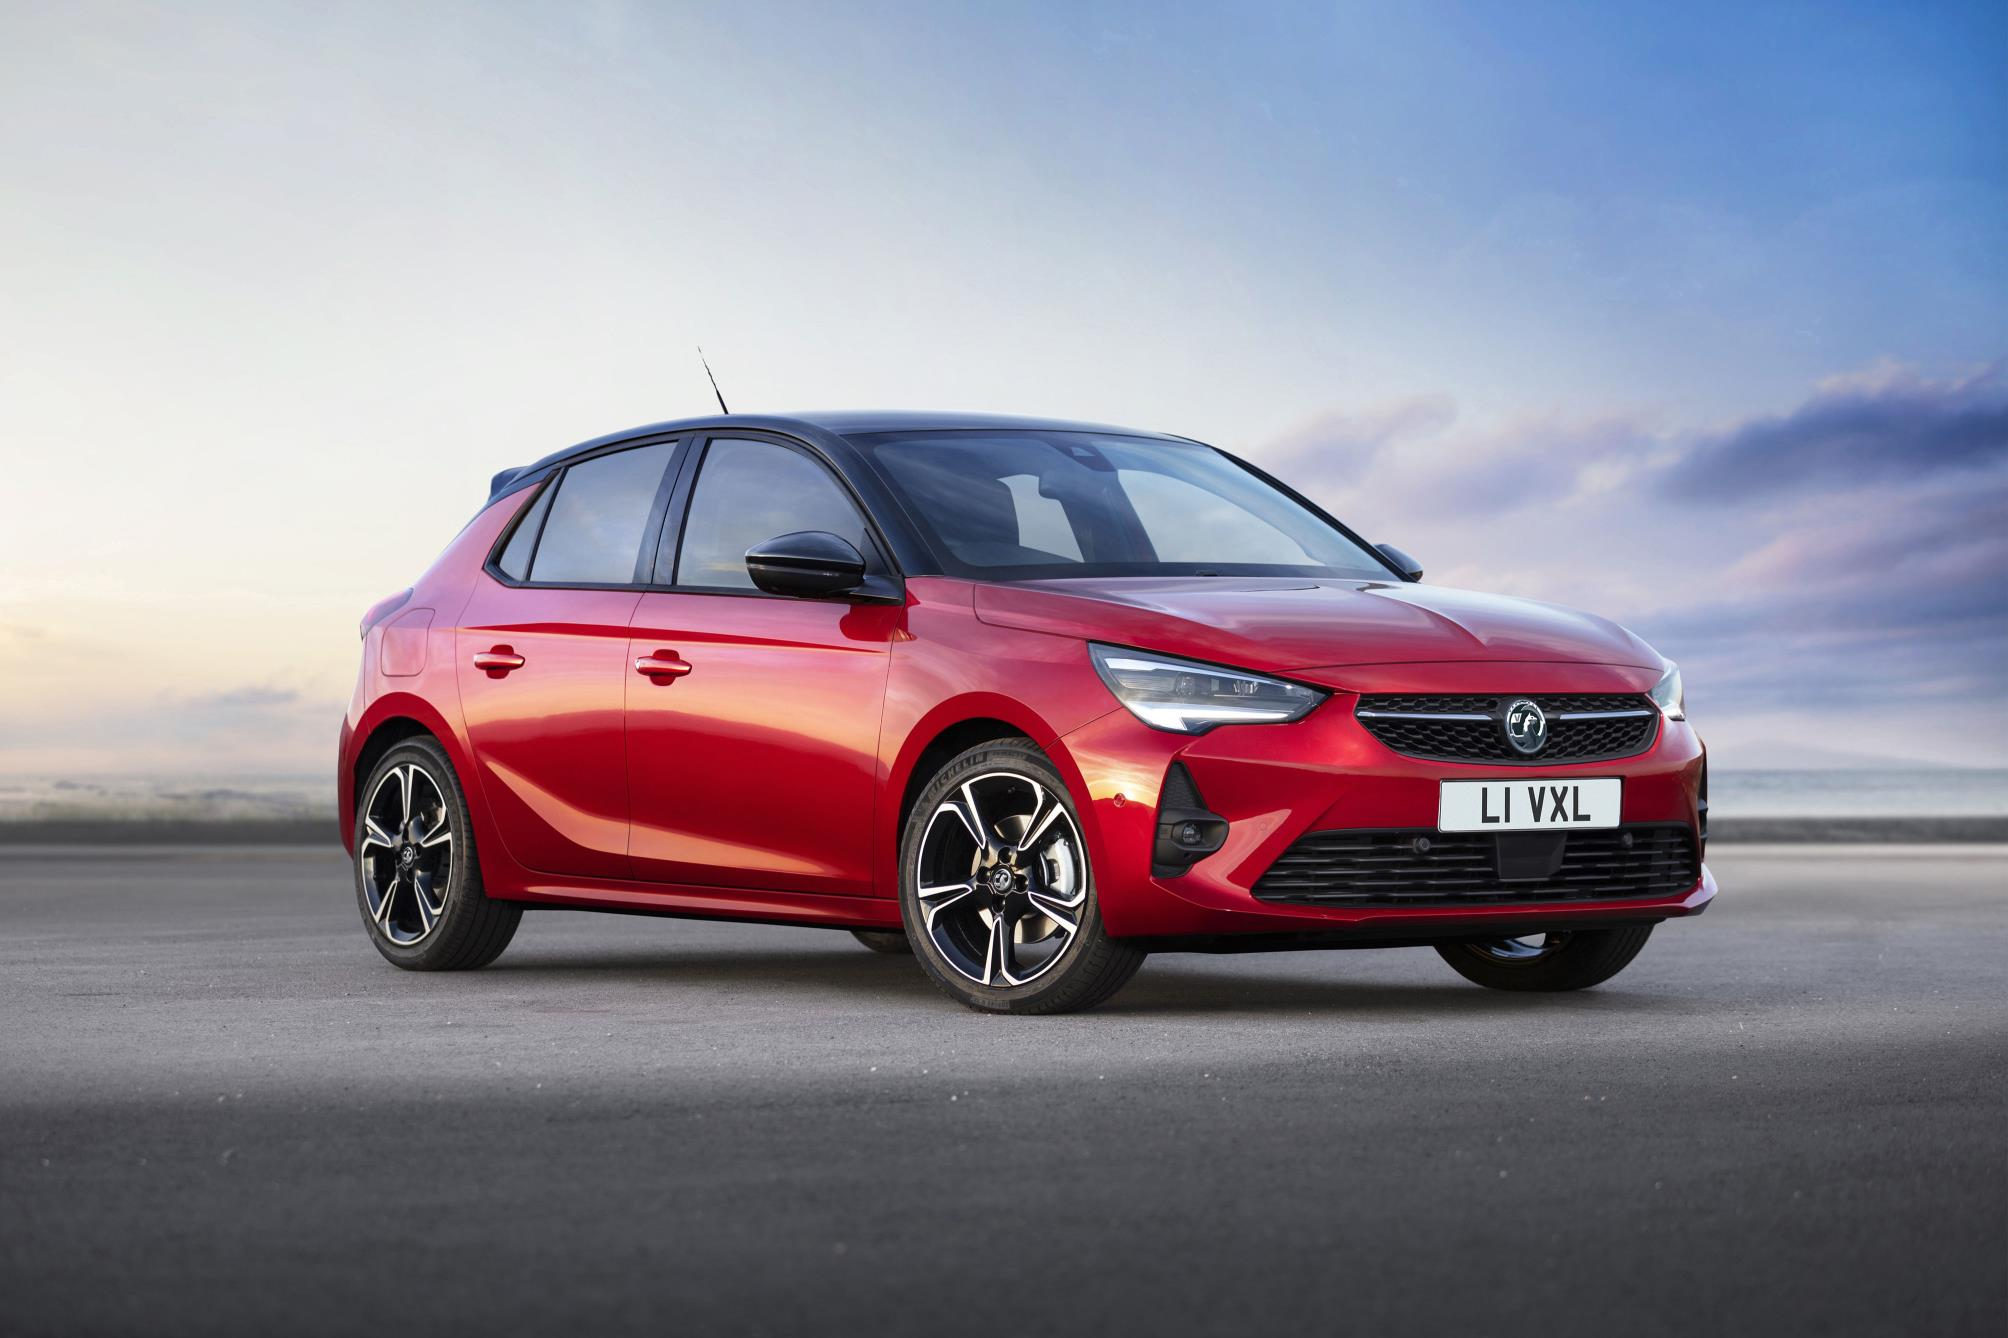 2019 Vauxhall Corsa .jpg (181 KB)